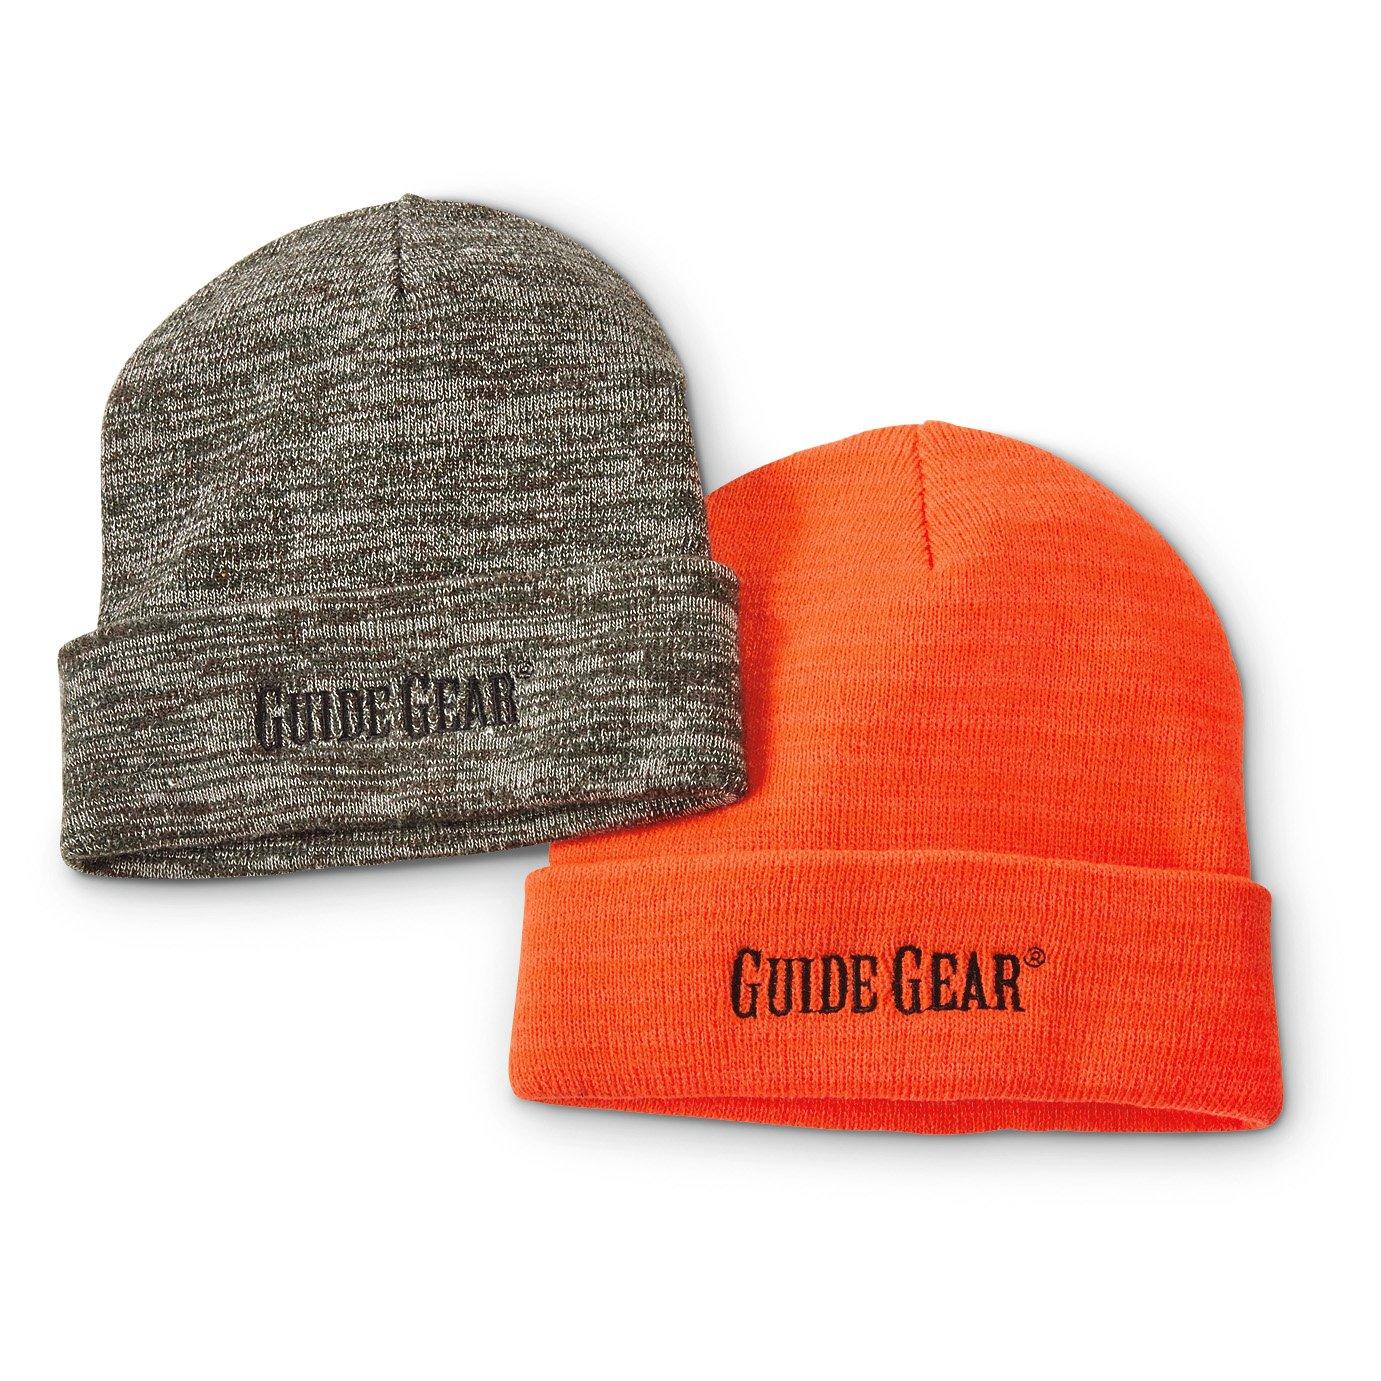 6b7575d6cc4 Amazon.com   Guide Gear Knit Beanies 2 Pack   Sports   Outdoors